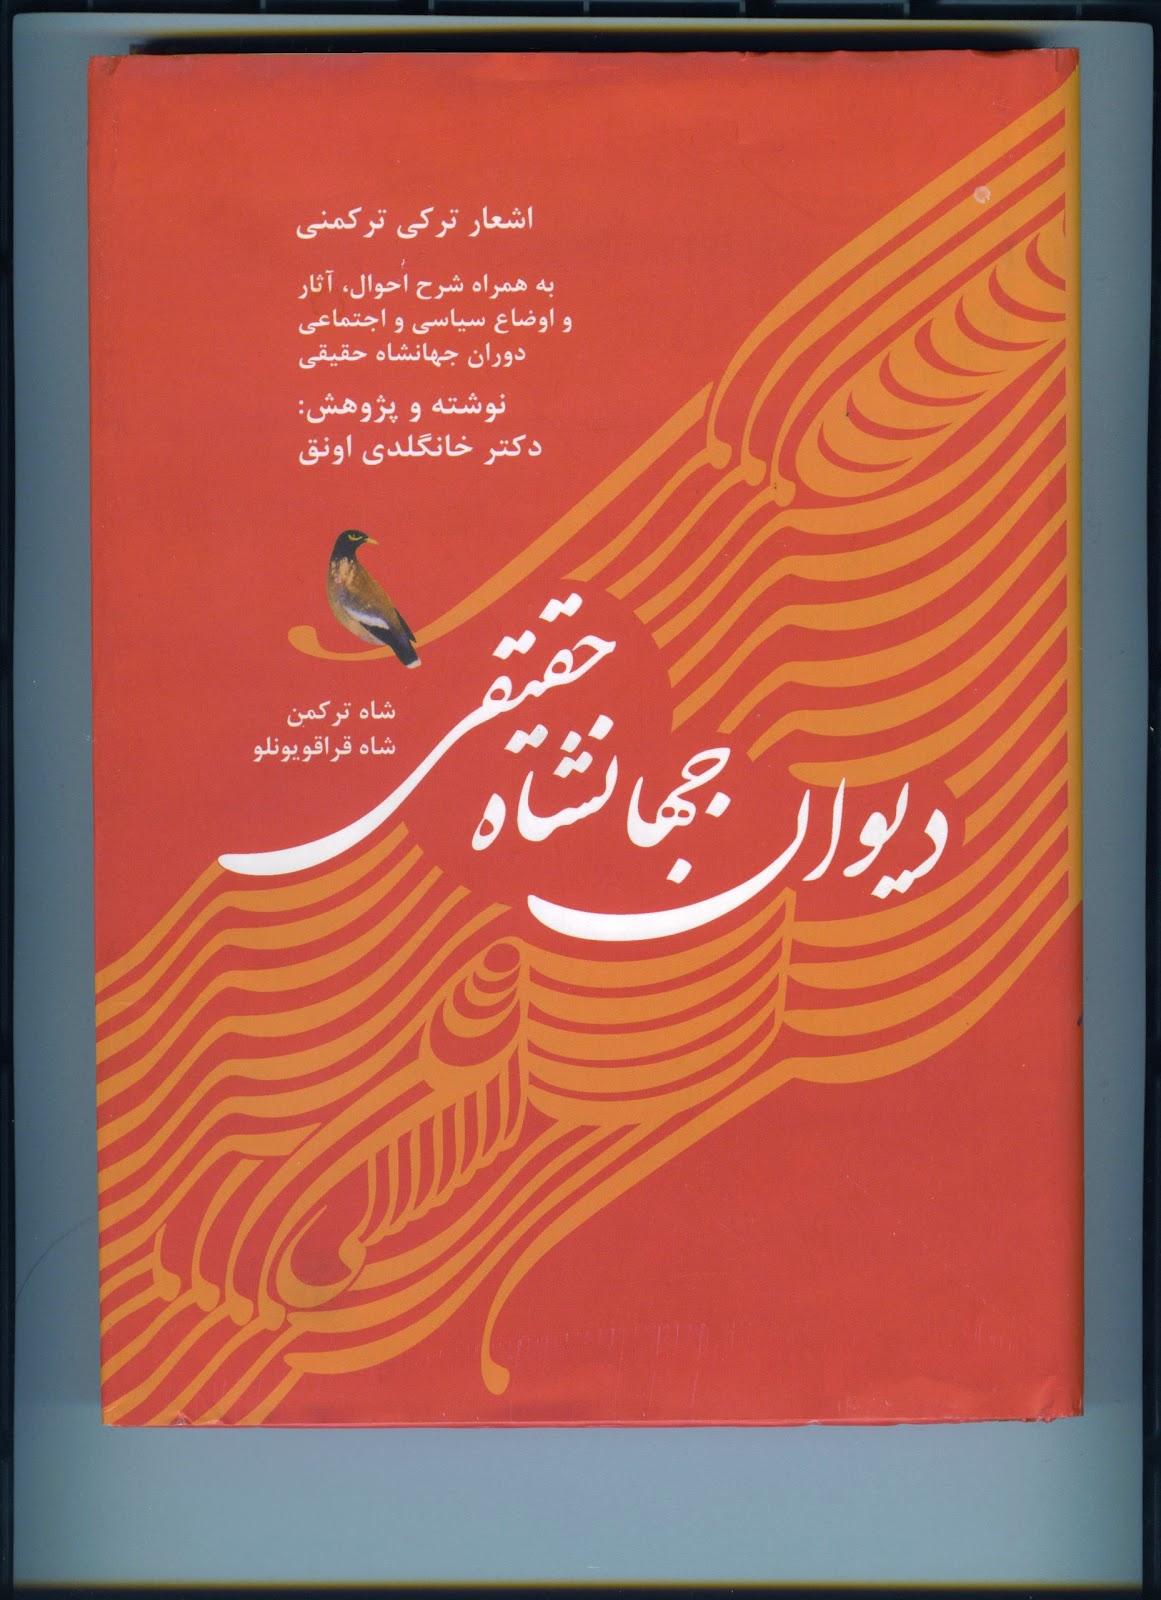 Divan Jahanshah Haghighi-دیوان جهانشاه حقیقی